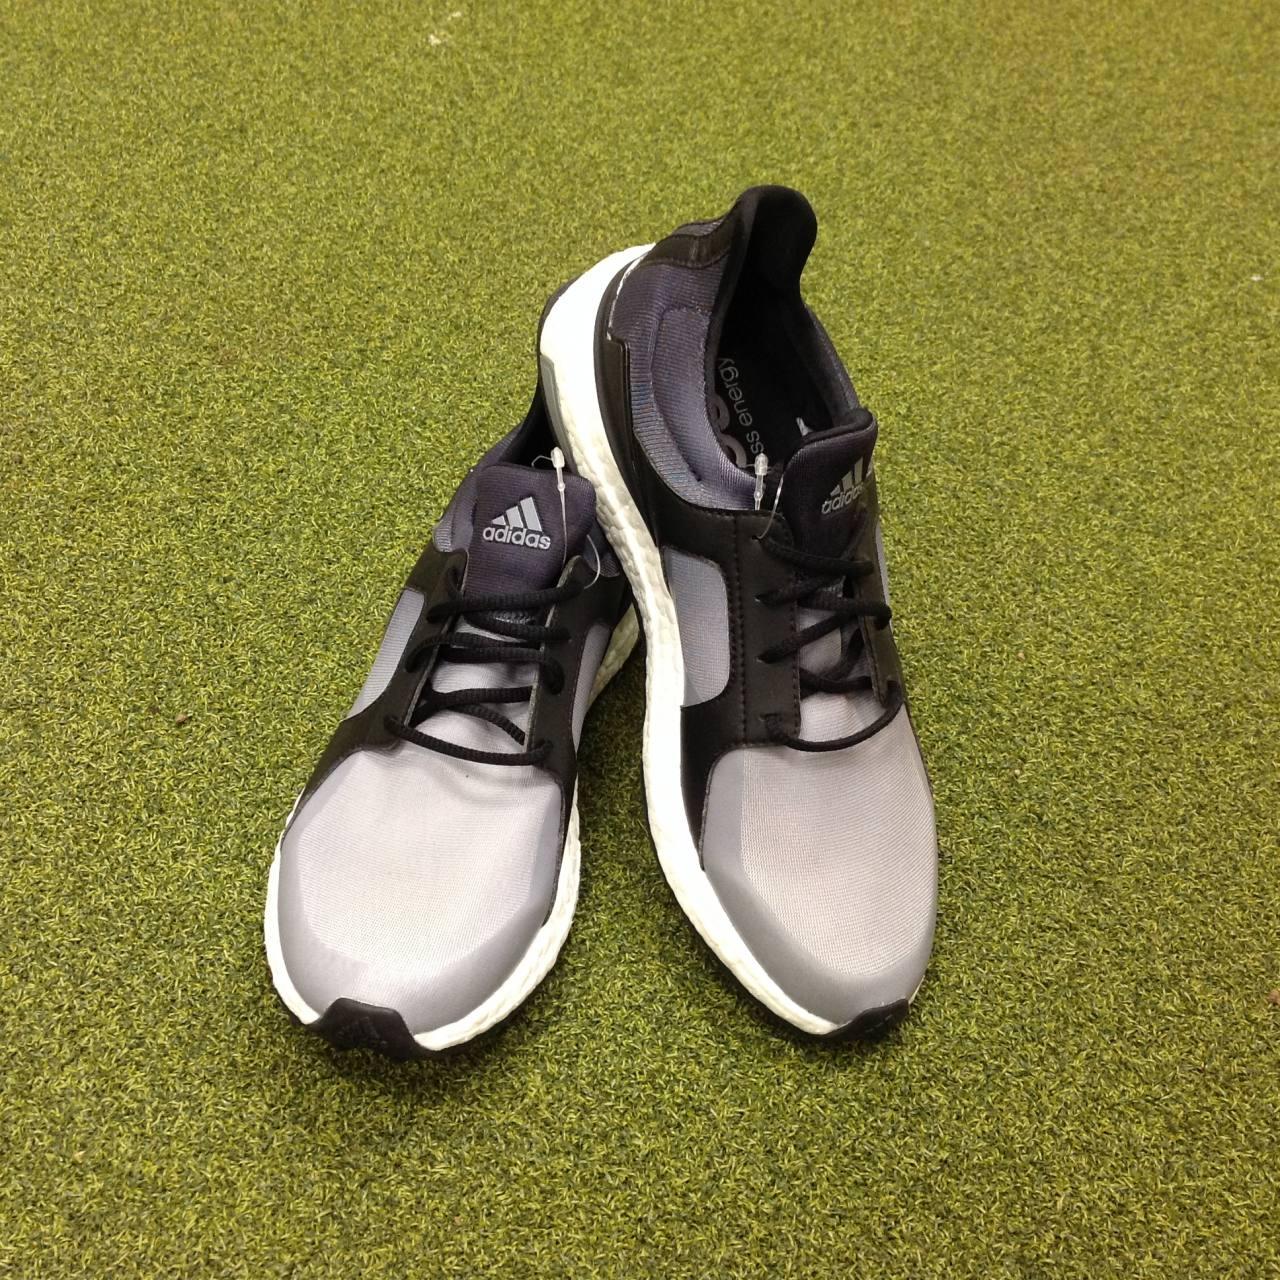 nuovo signore adidas climacross impulso scarpe da golf uk numero noi